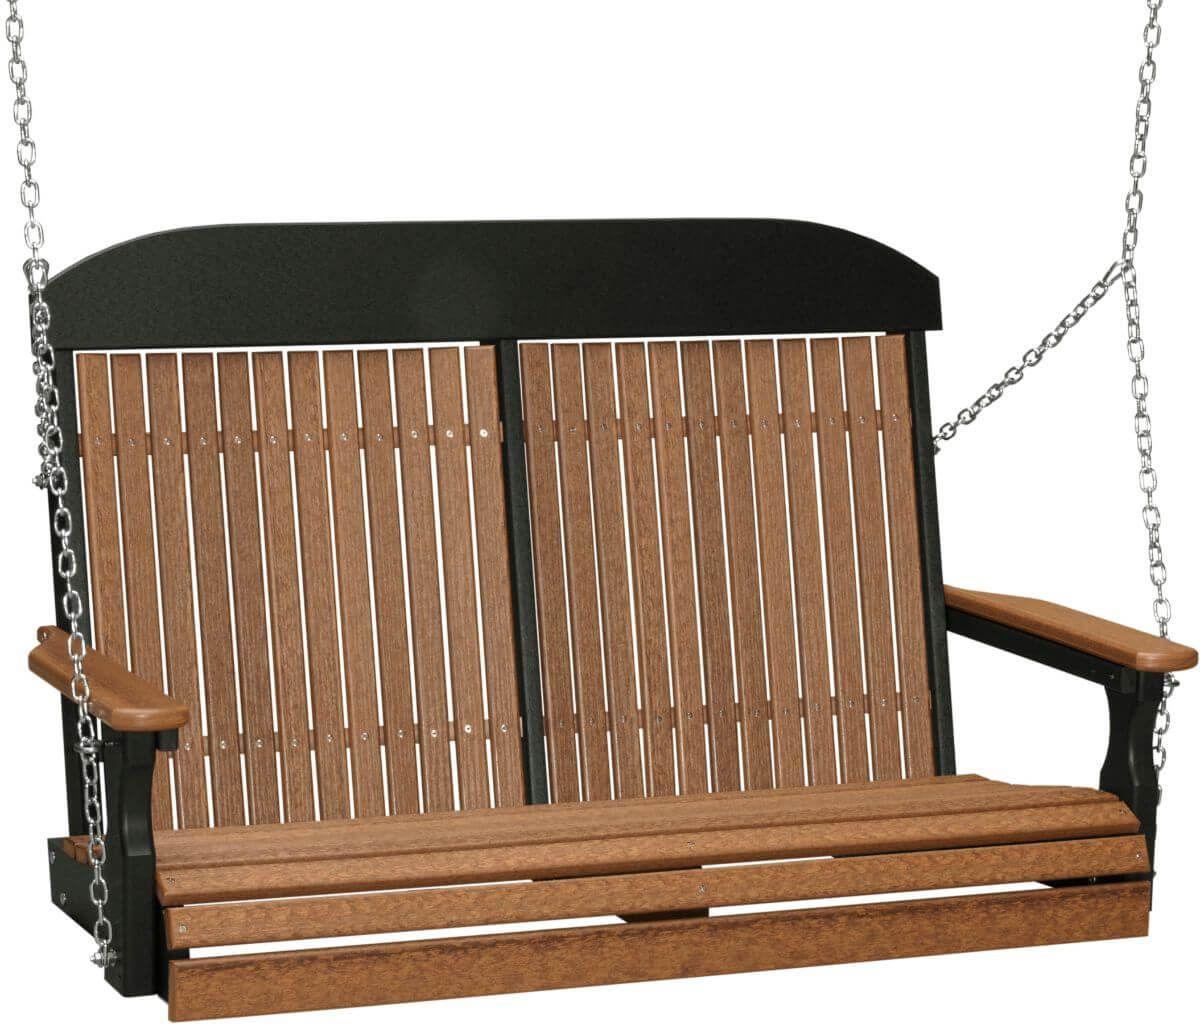 Antique Mahogany and Black Stockton Porch Swing